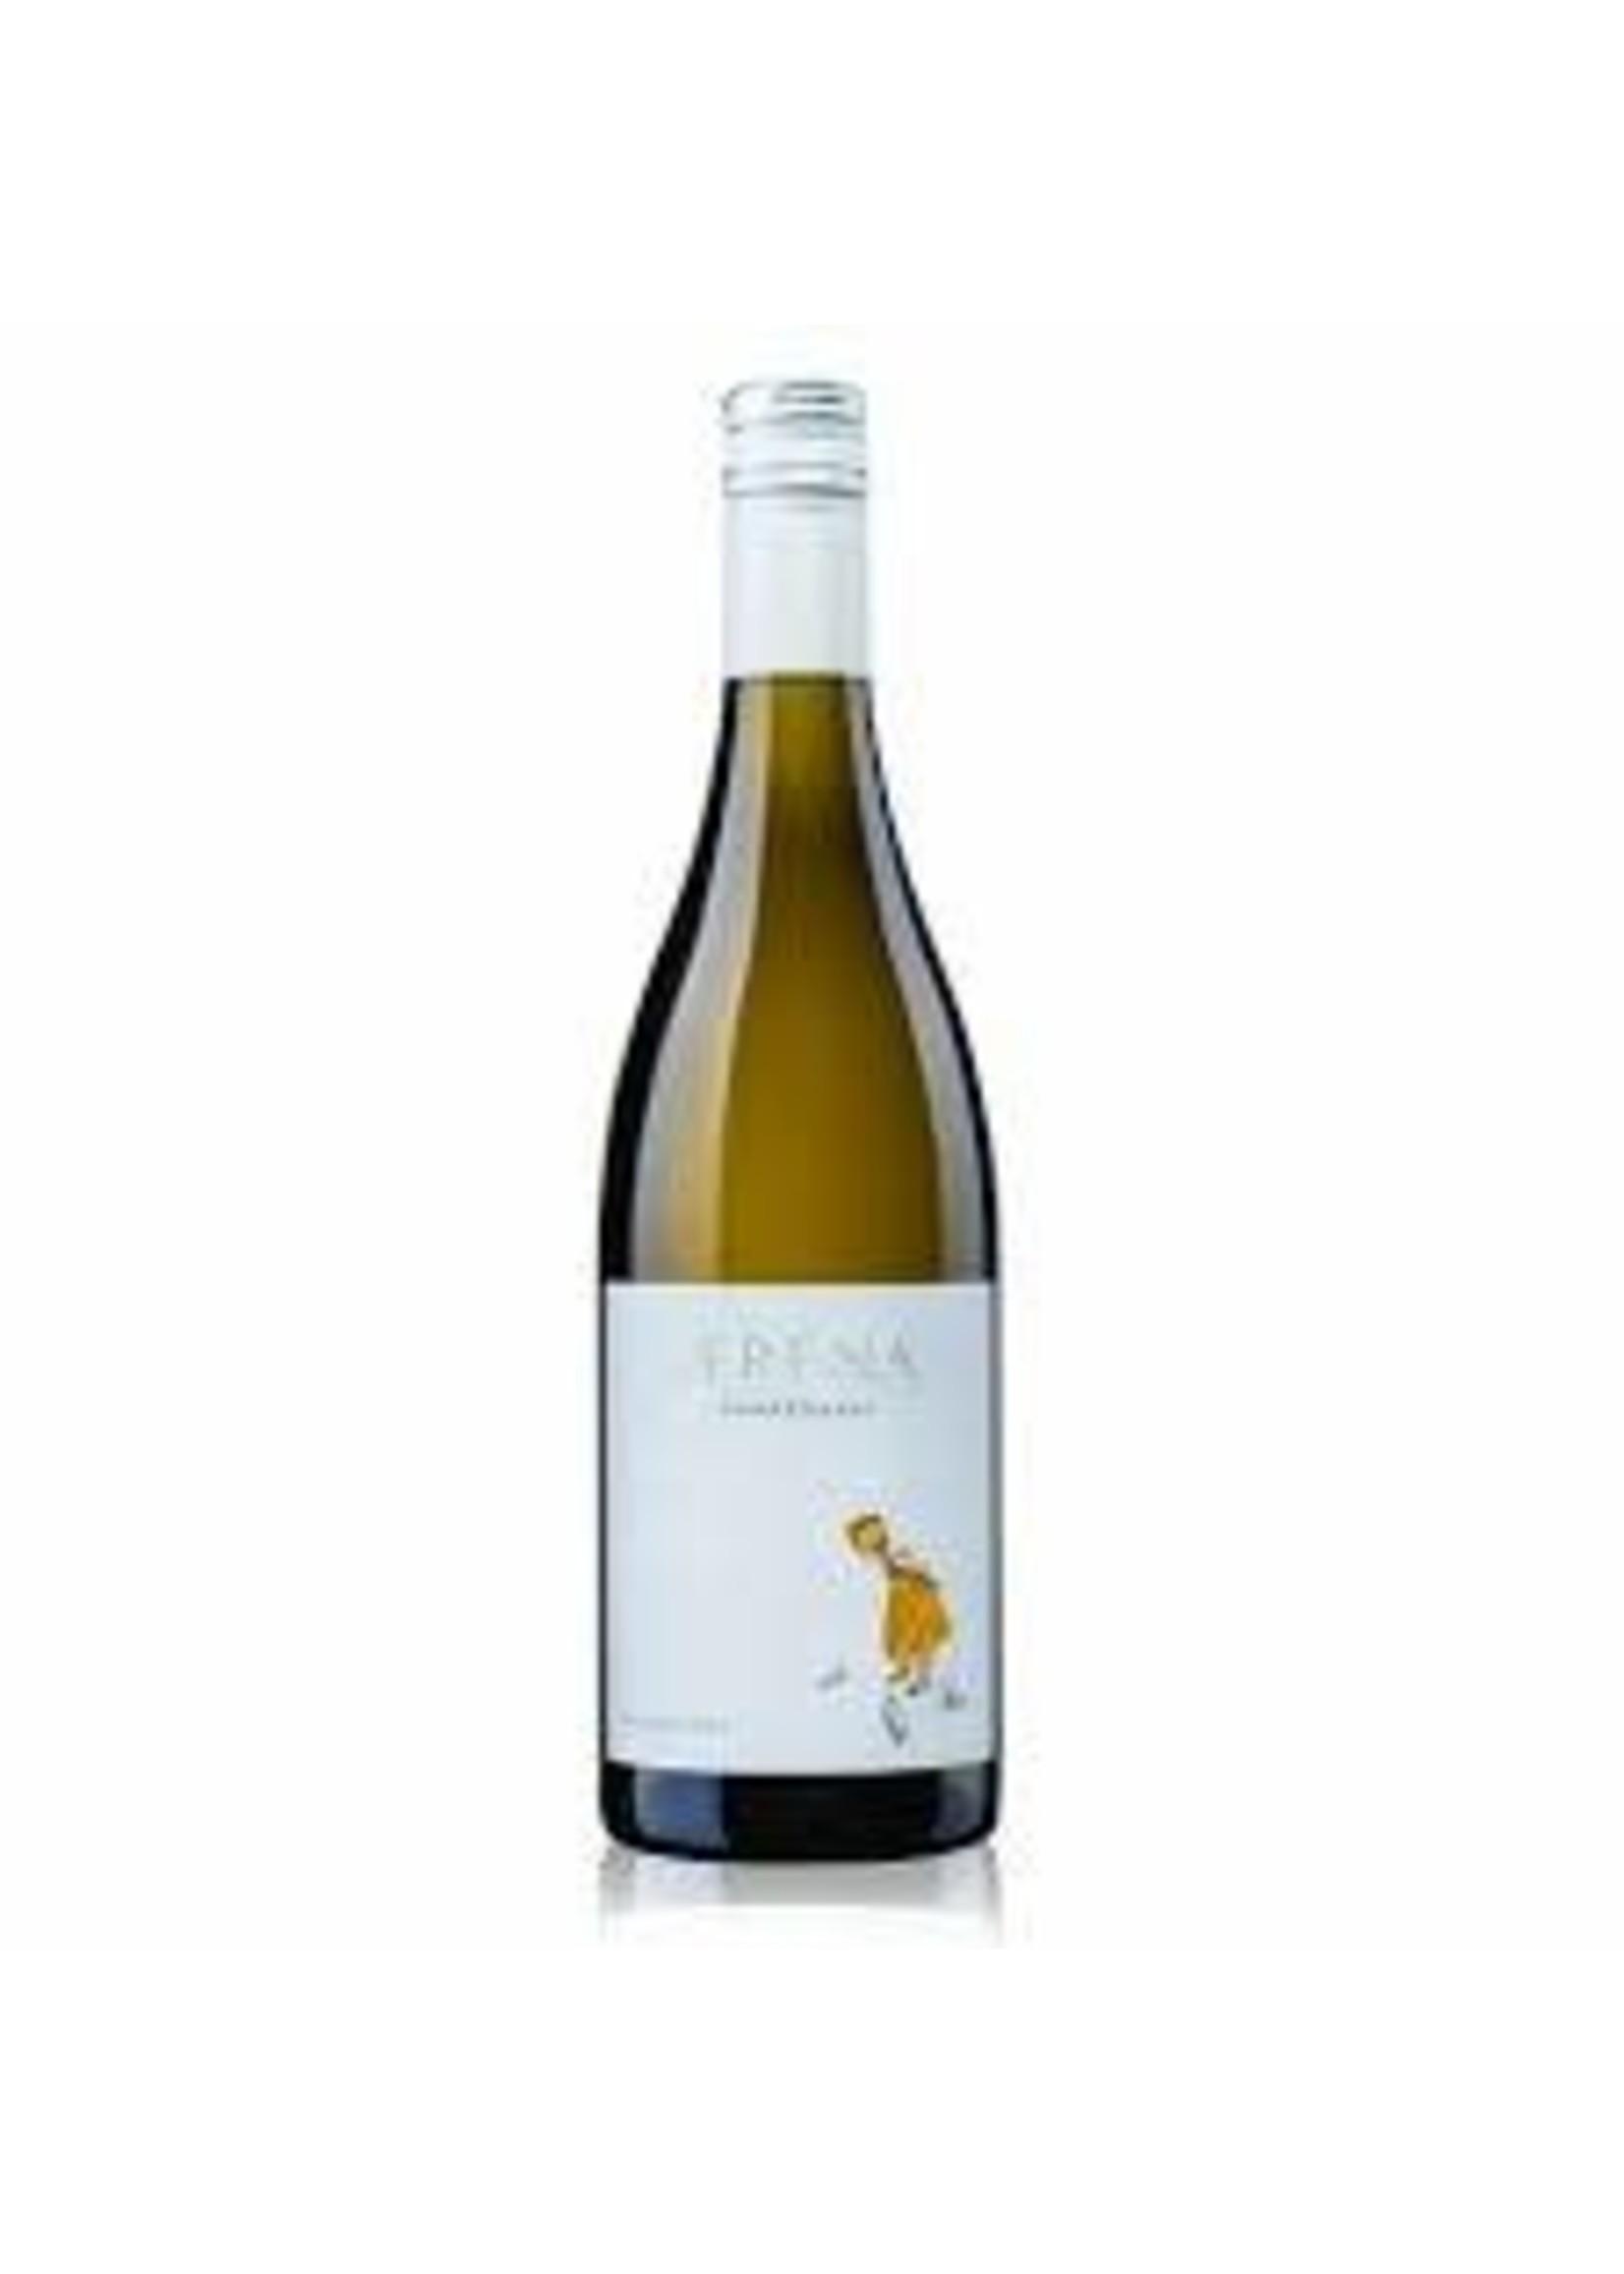 Aerena 2018 Chardonnay 750ml